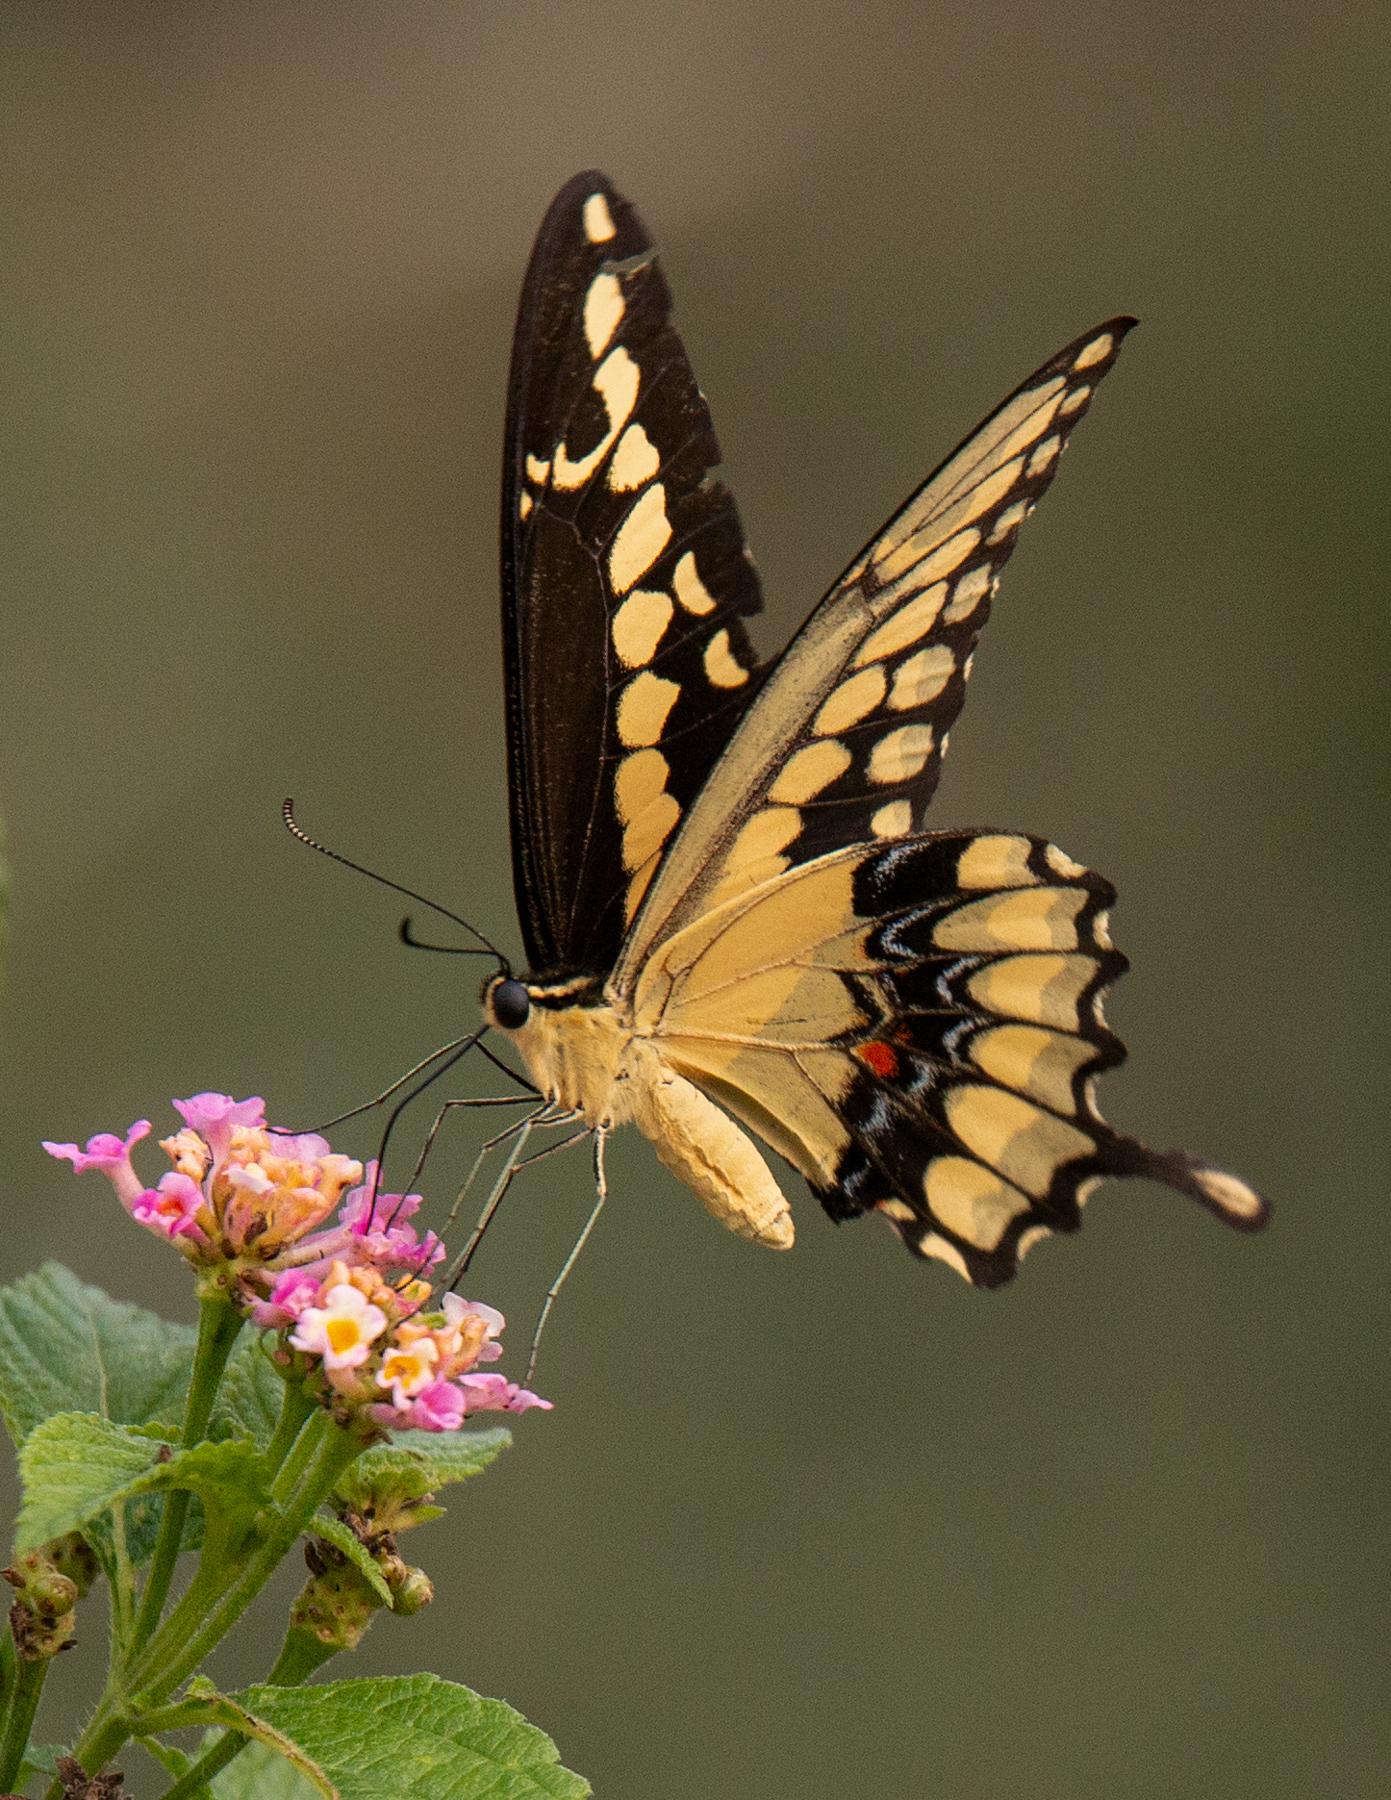 arabella-dane-giant swallowtail_MG_0786.jpg